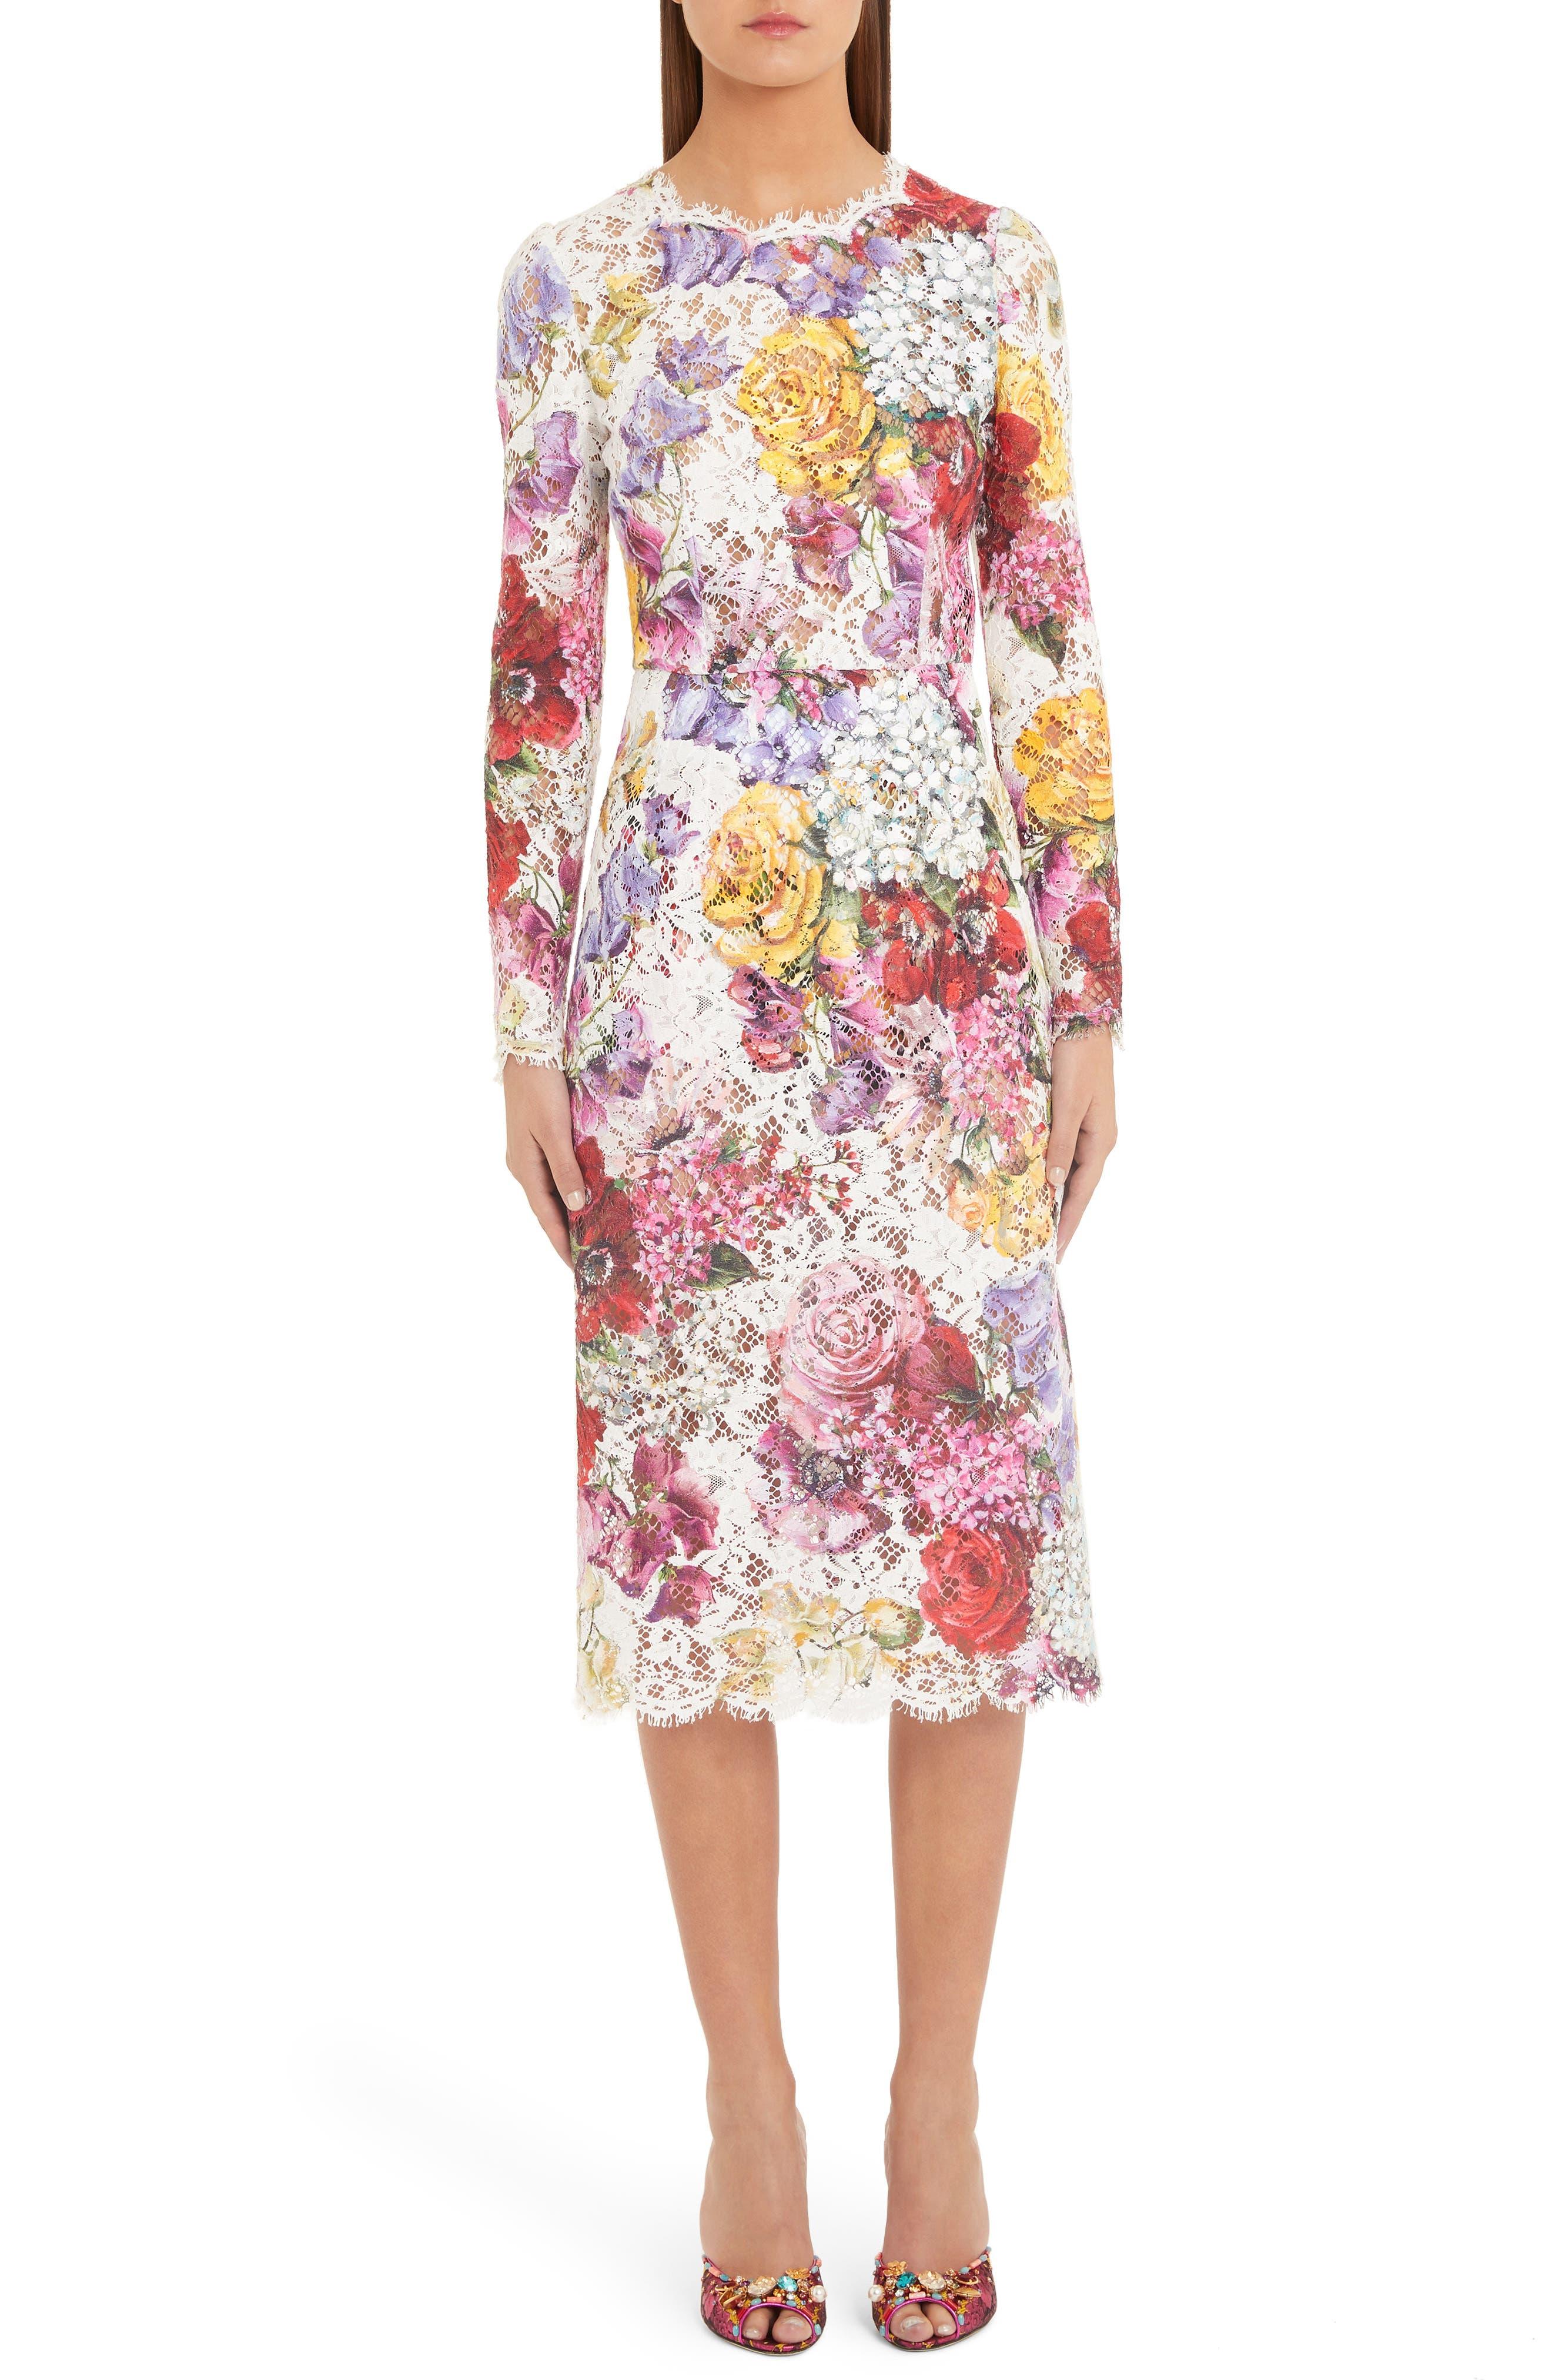 Dolce & gabbana Floral Print Lace Pencil Dress